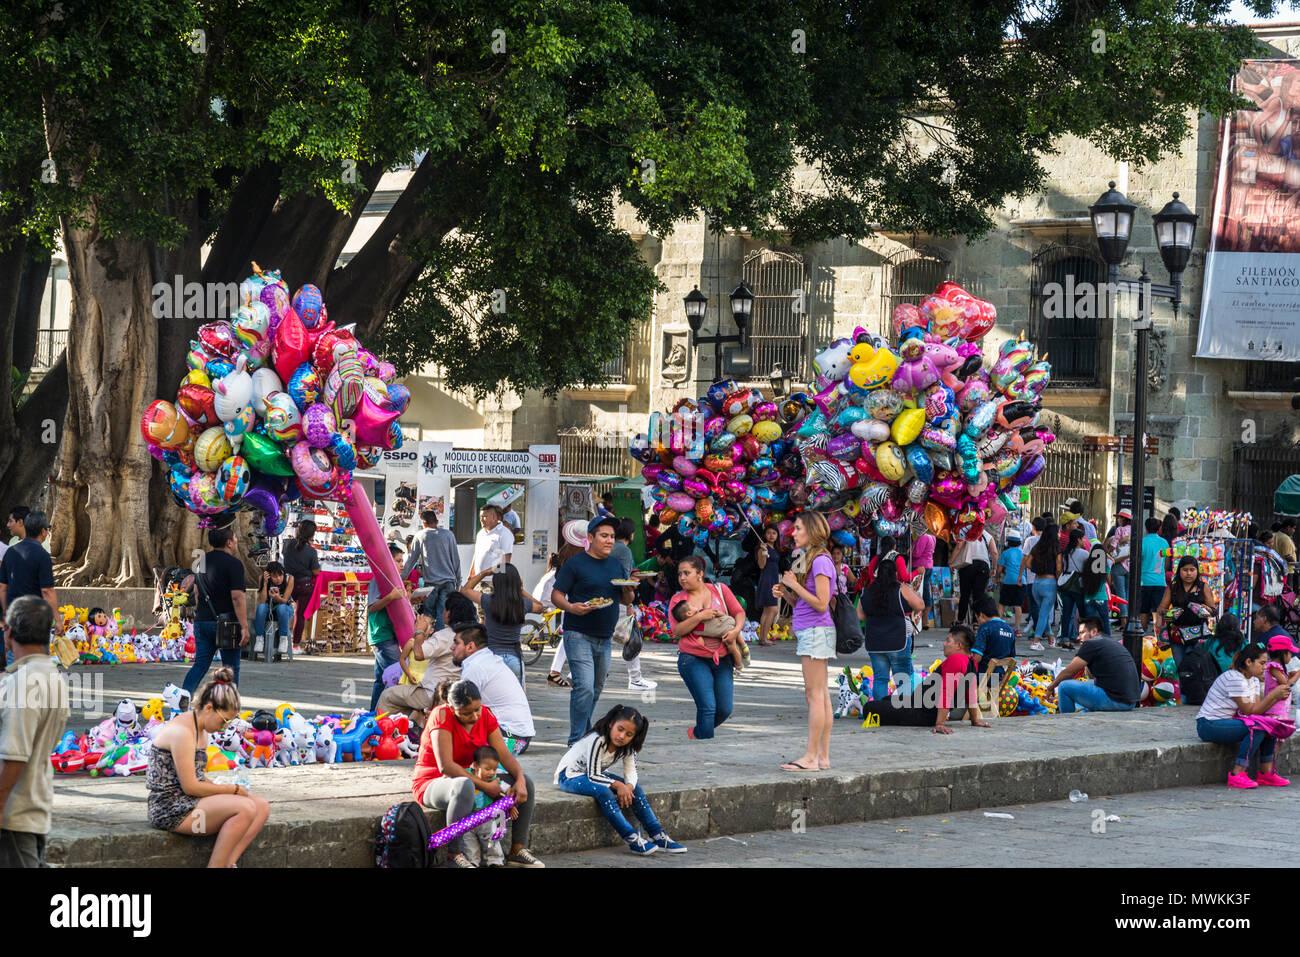 Street Sellers At Alameda De Leon Square Oaxaca Mexico